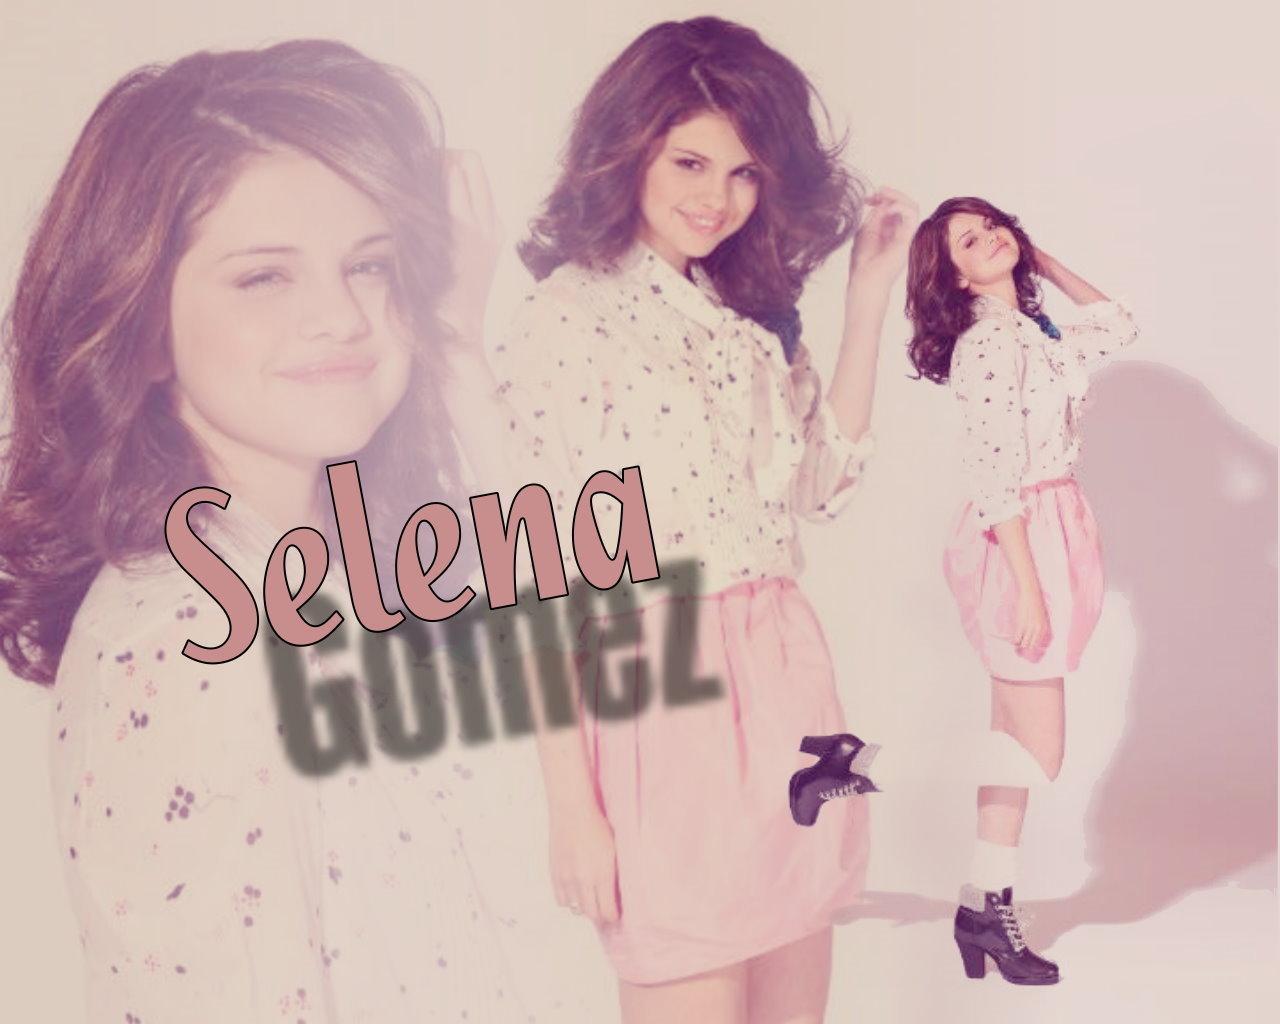 http://1.bp.blogspot.com/_938c0ZRtSnE/TTfxq2LANlI/AAAAAAAAAA4/9aFh9CEPHlE/s1600/Selena-Gomez-Wallpaper-selena-gomez-6516830-1280-1024.jpg